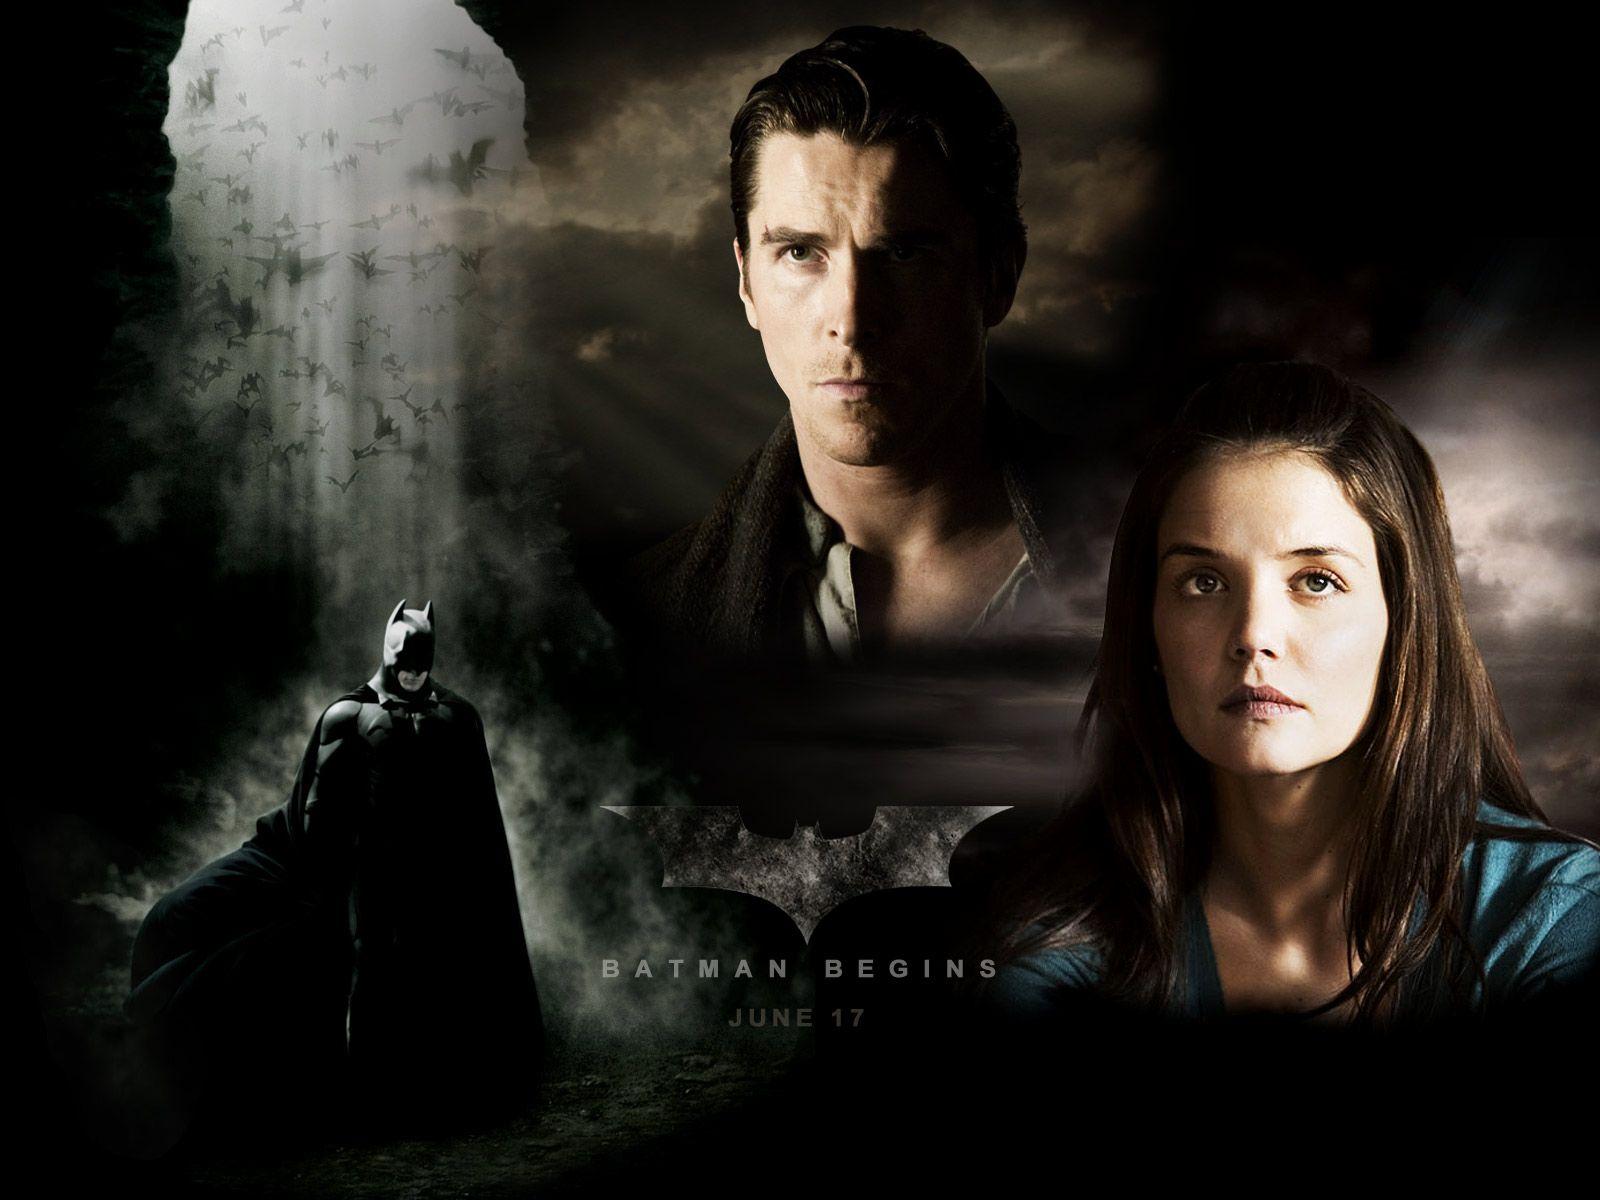 Batman Begins Wallpaper Movies Christopher Nolan